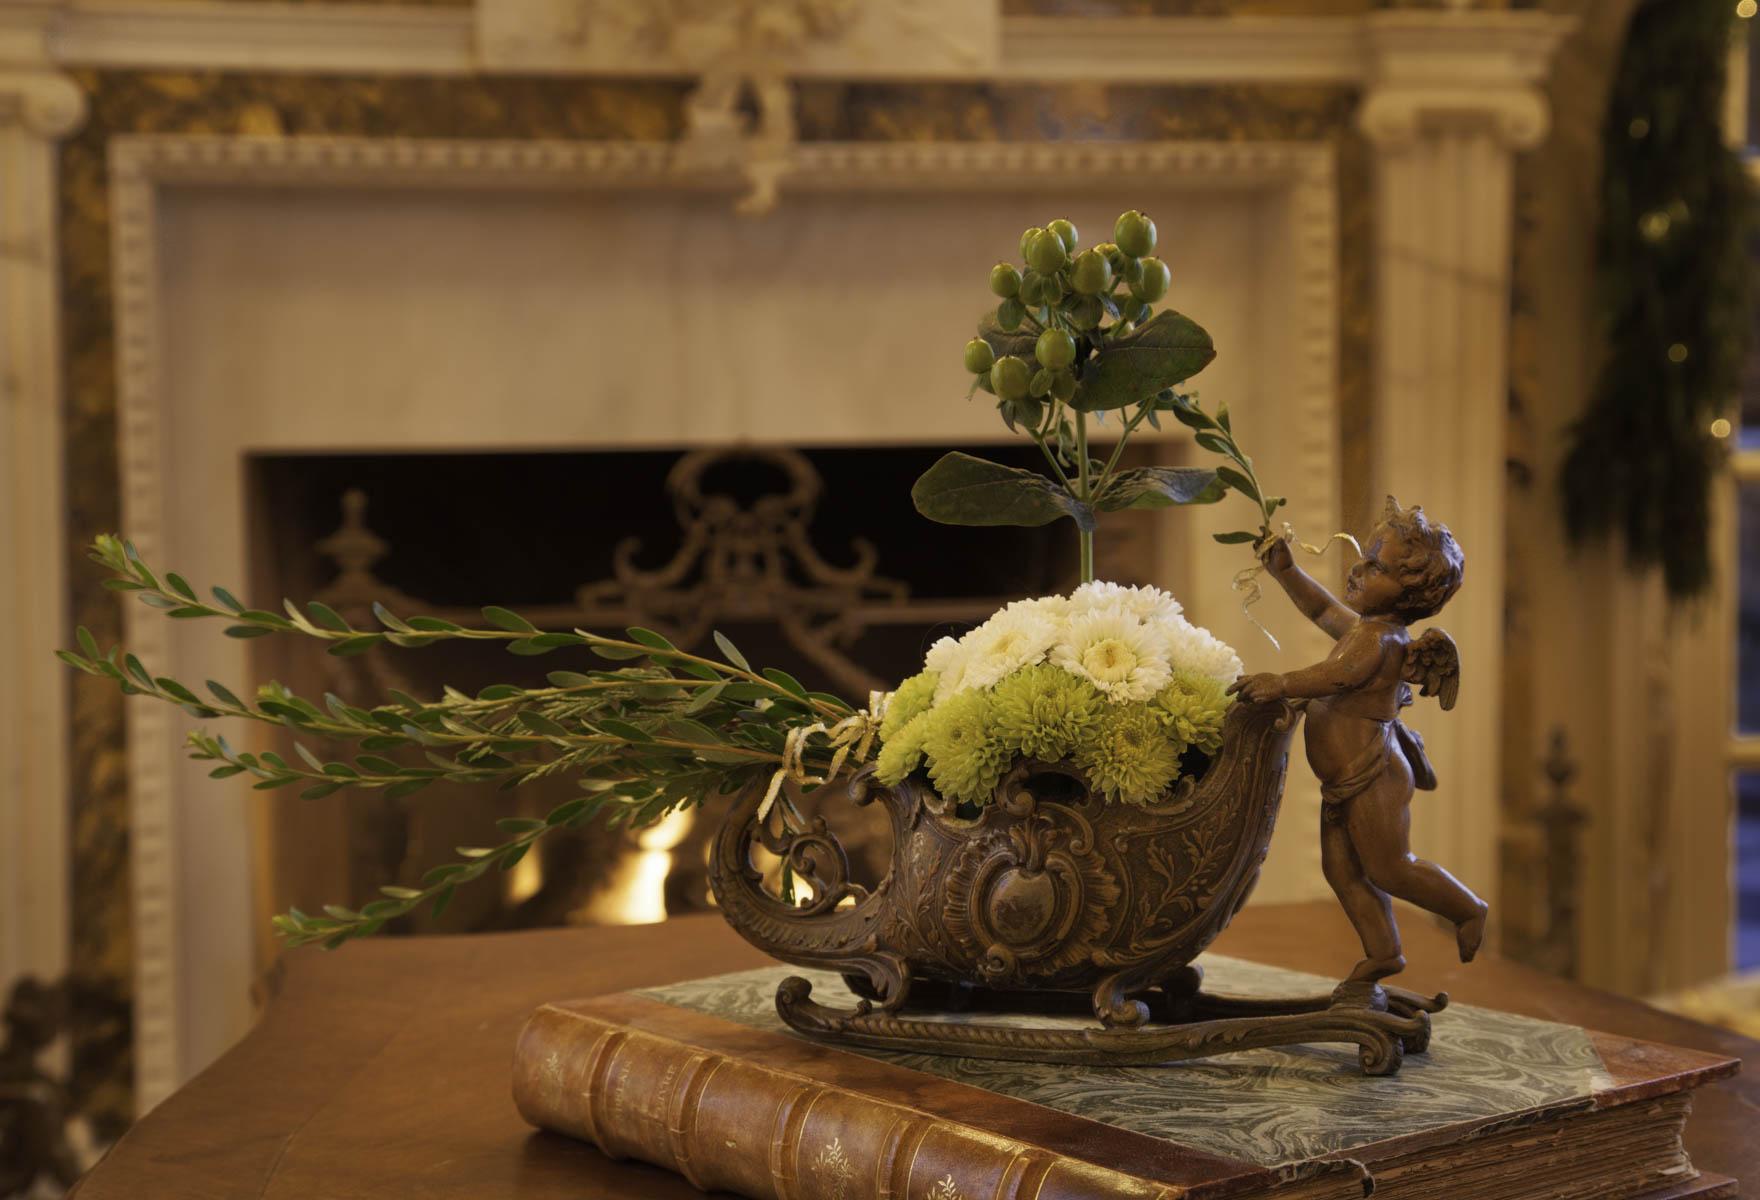 Cherub & Sleigh Floral Vase Holiday Design by Jennifer Chapman